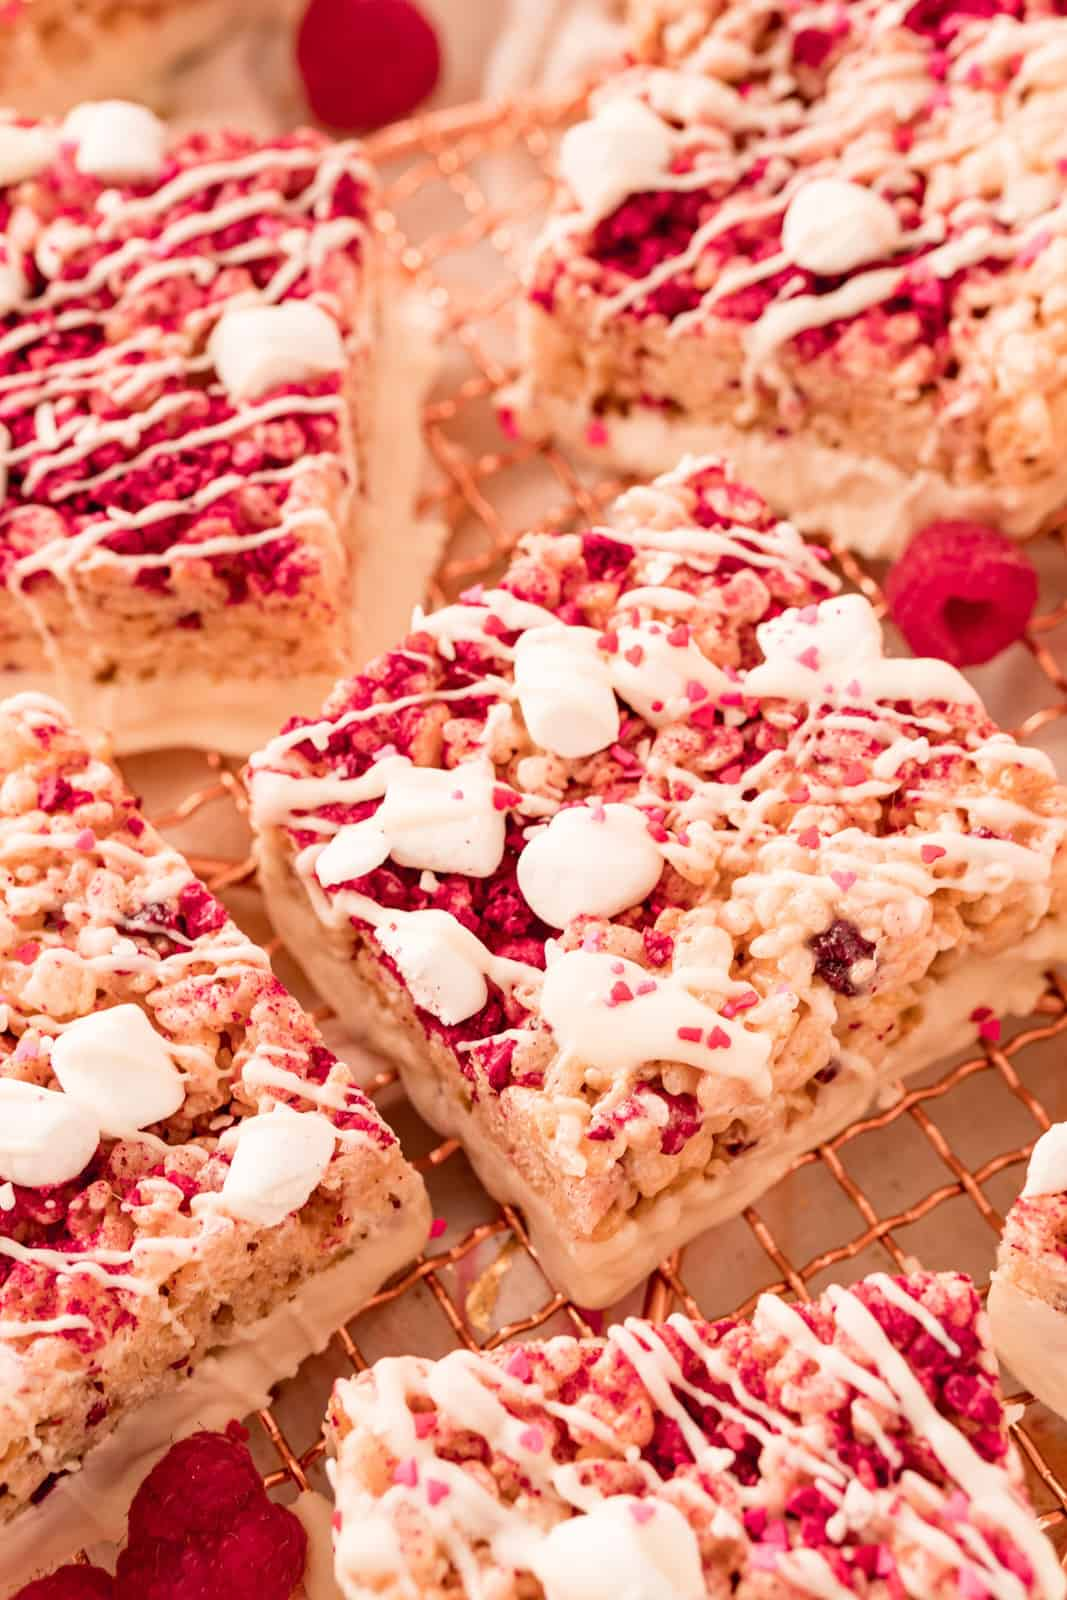 Close up of one Valentine's Rice Krispie Treat